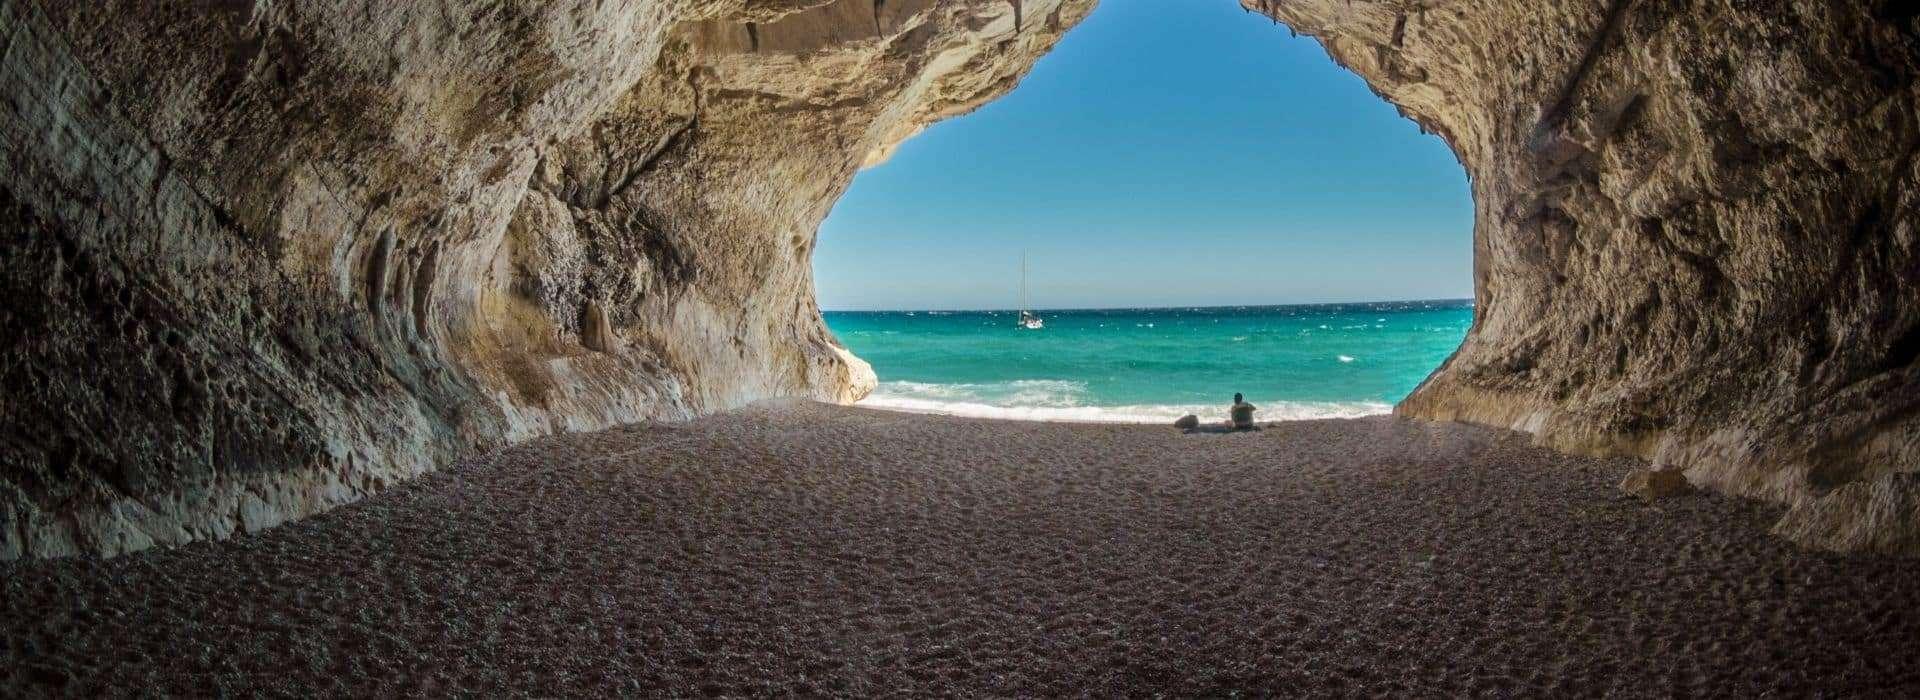 visit Cyprus beaches